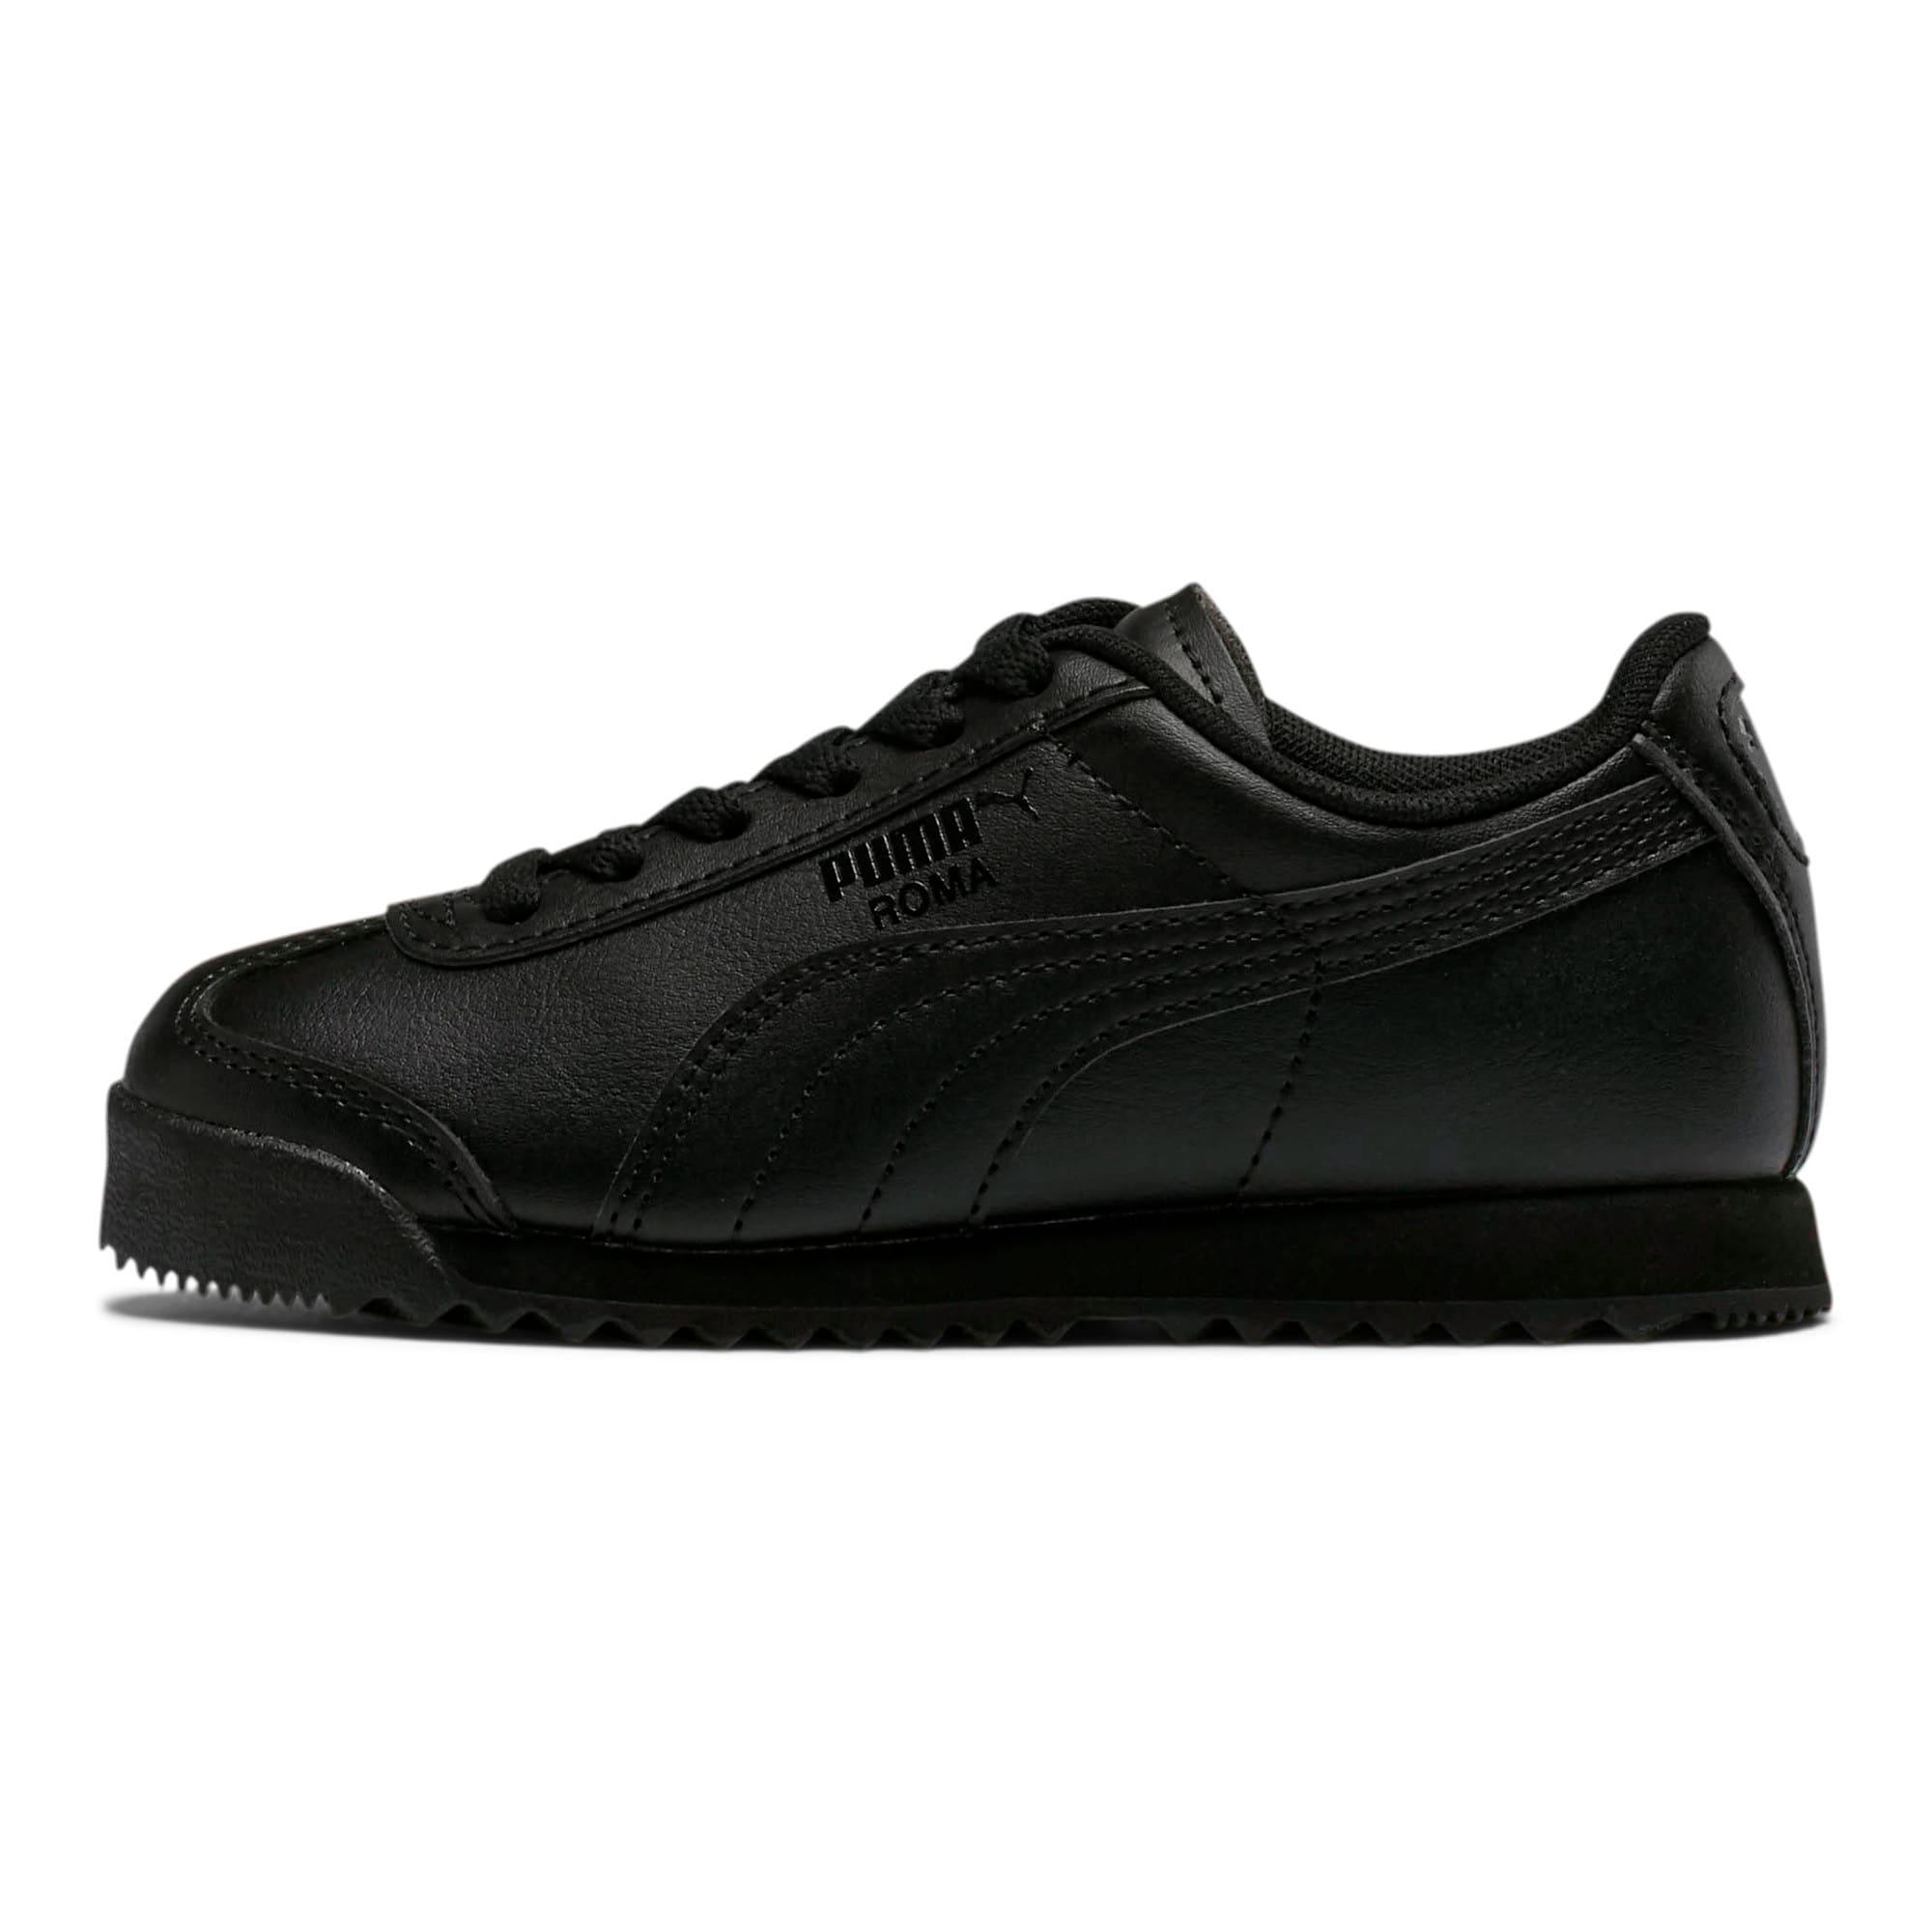 Thumbnail 1 of Roma Basic Little Kids' Shoes, Puma Black-Puma Black, medium